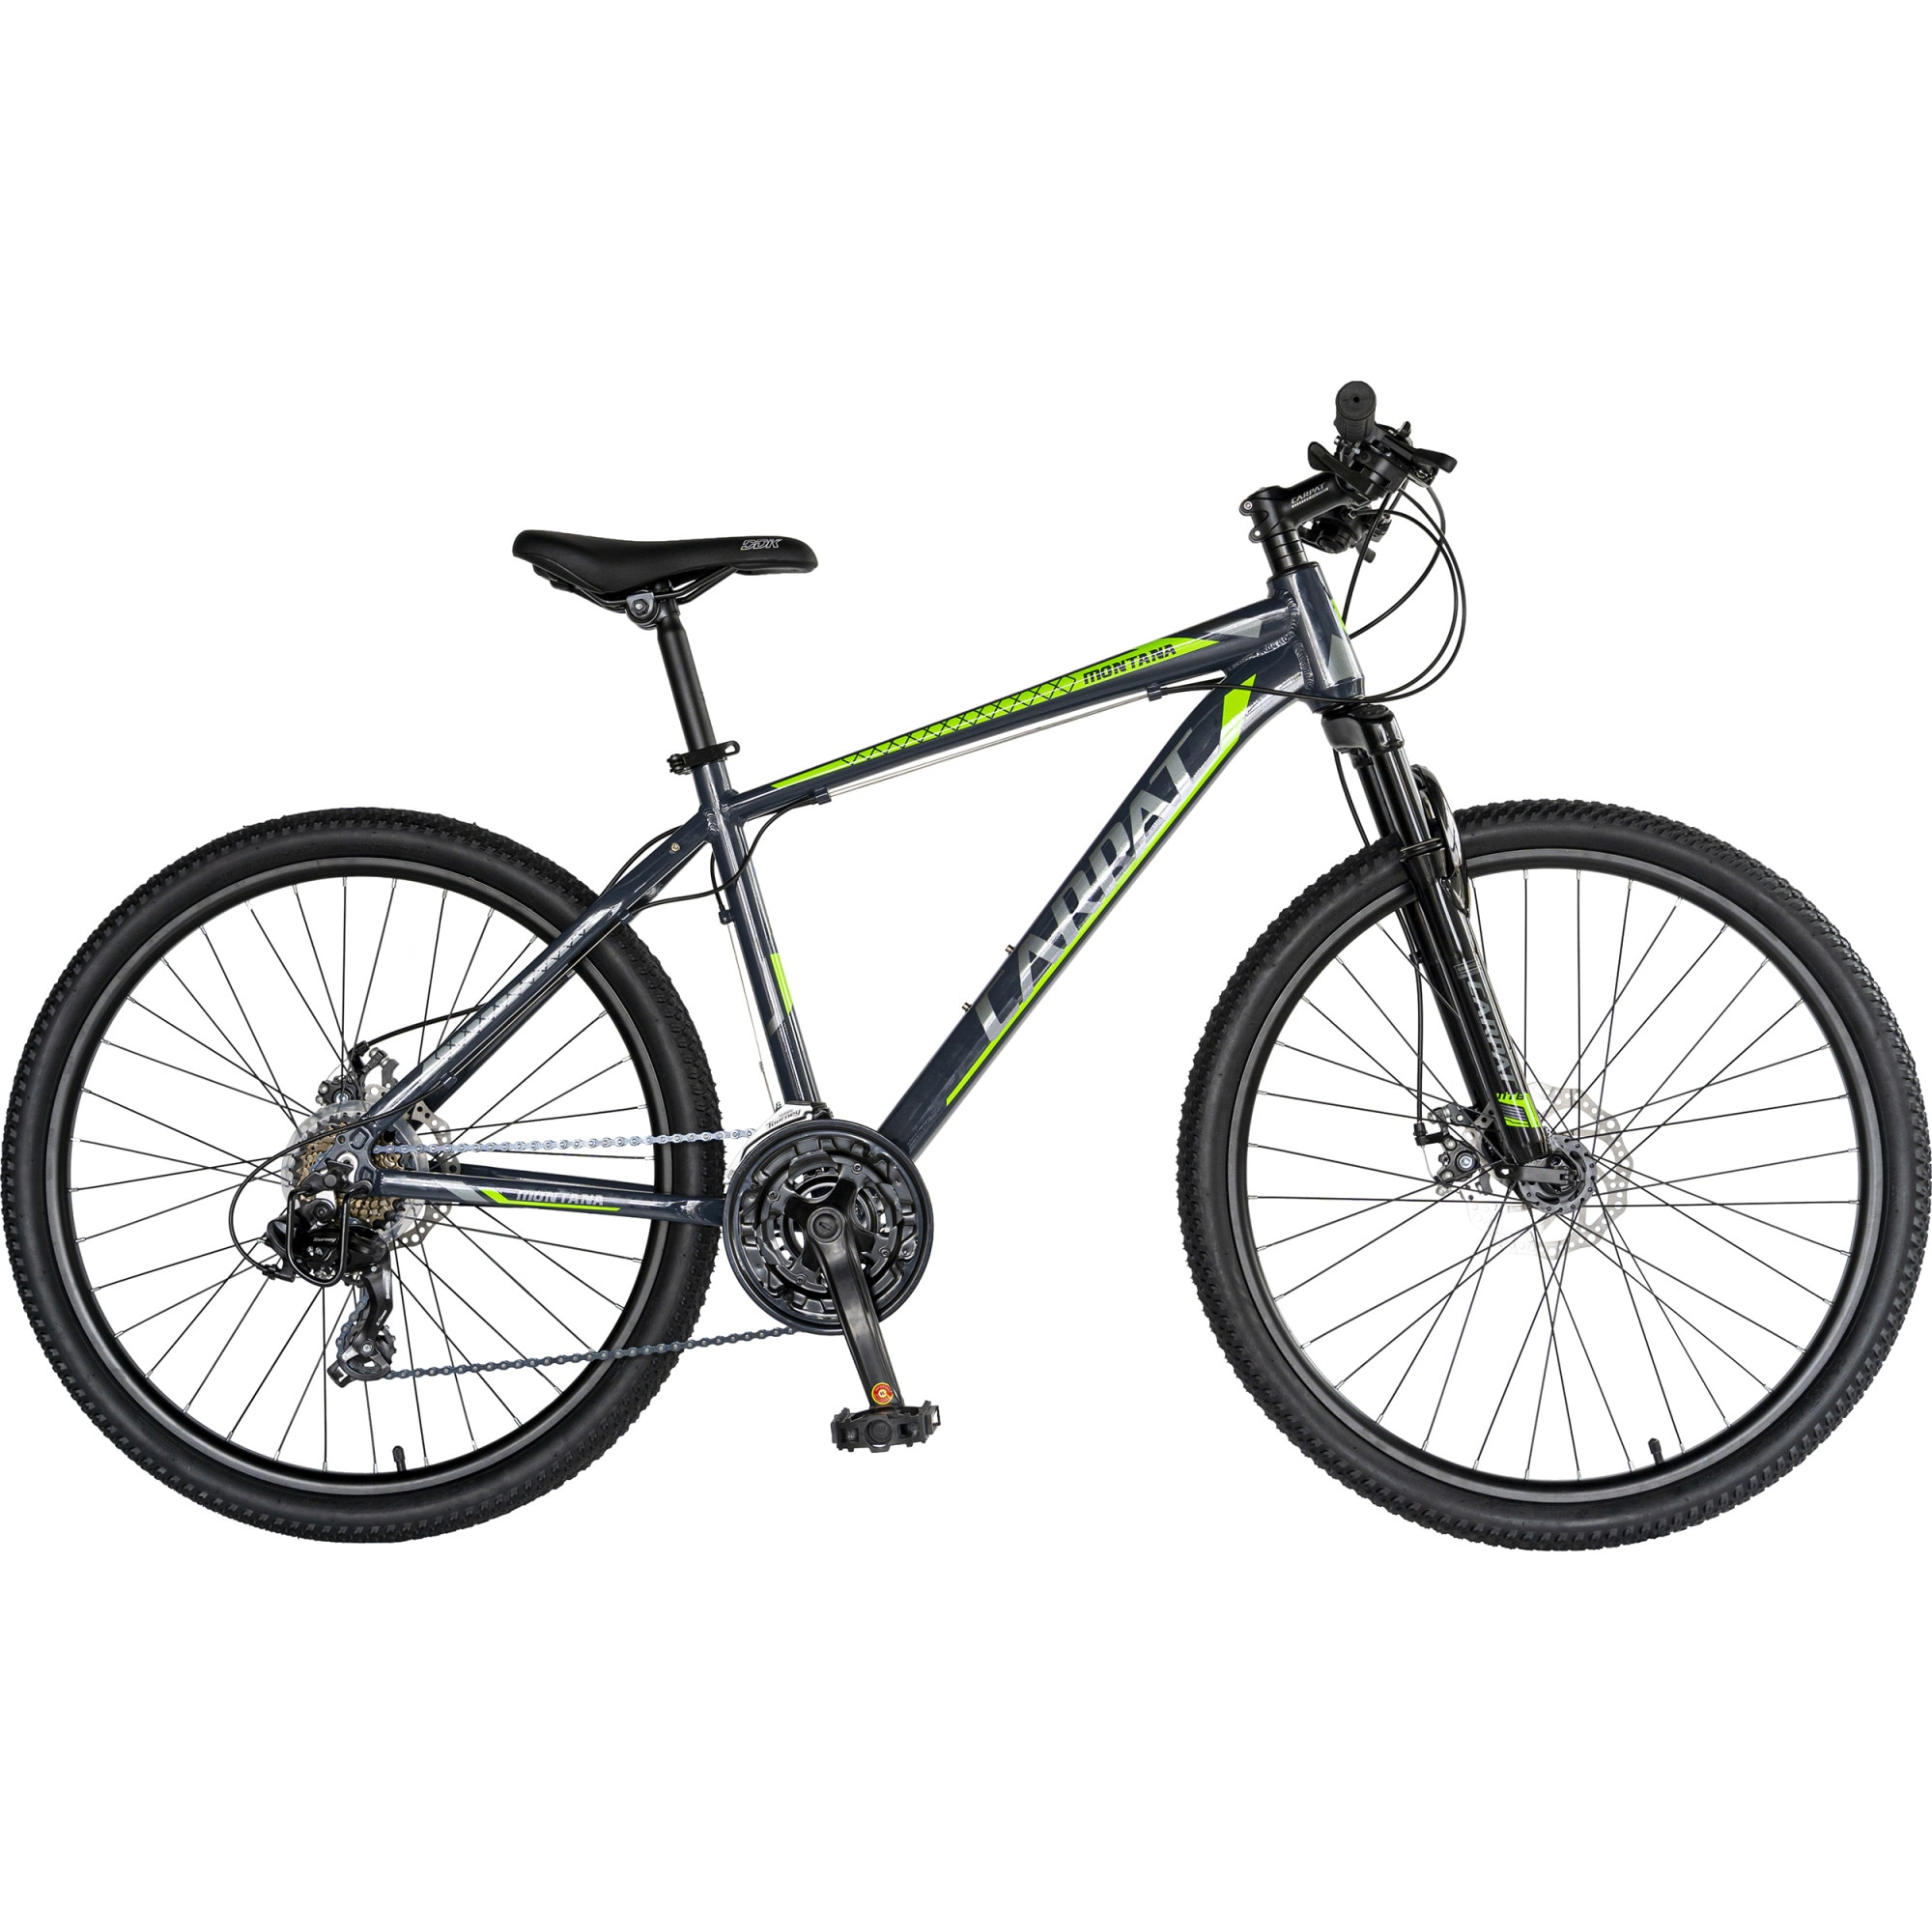 "Fotografie Bicicleta MTB 26"" Carpat C2670C, Gri/Verde"